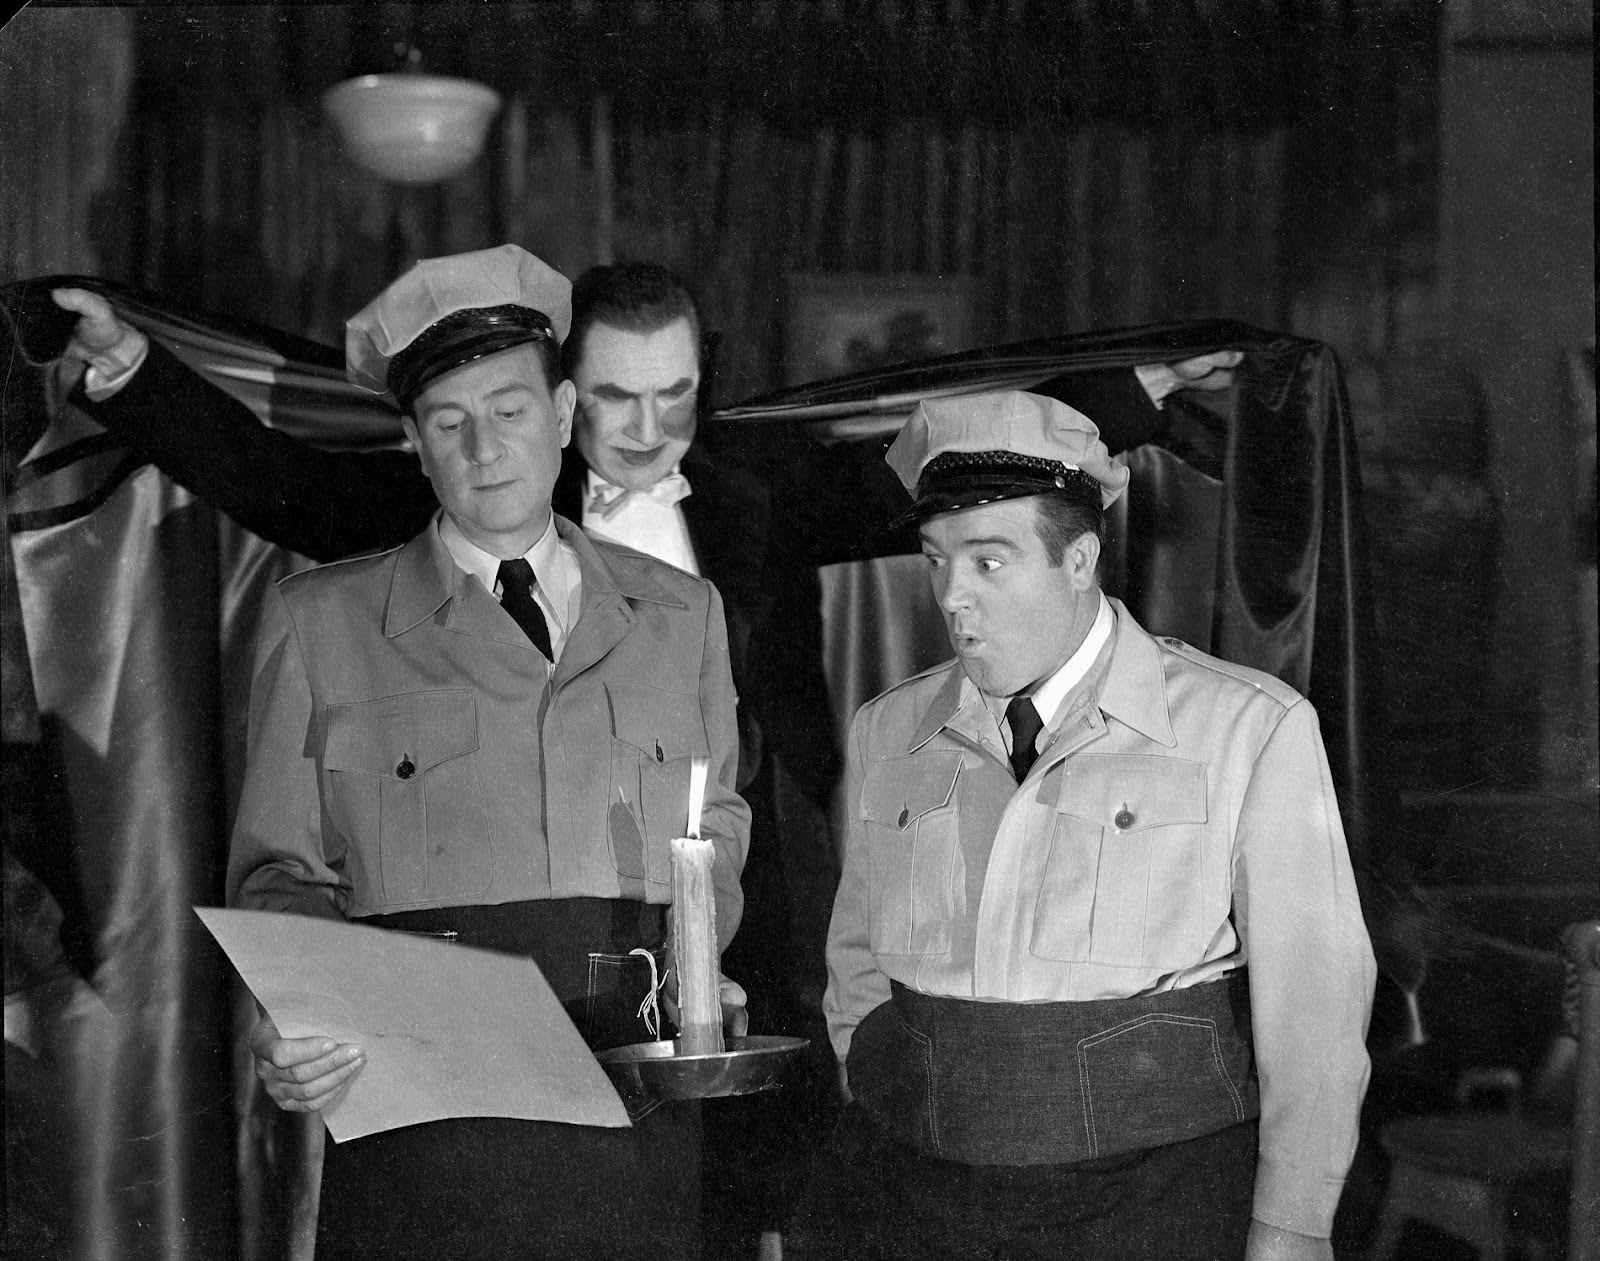 Bud Abbott Lou Costello Bela Lugosi Dracula